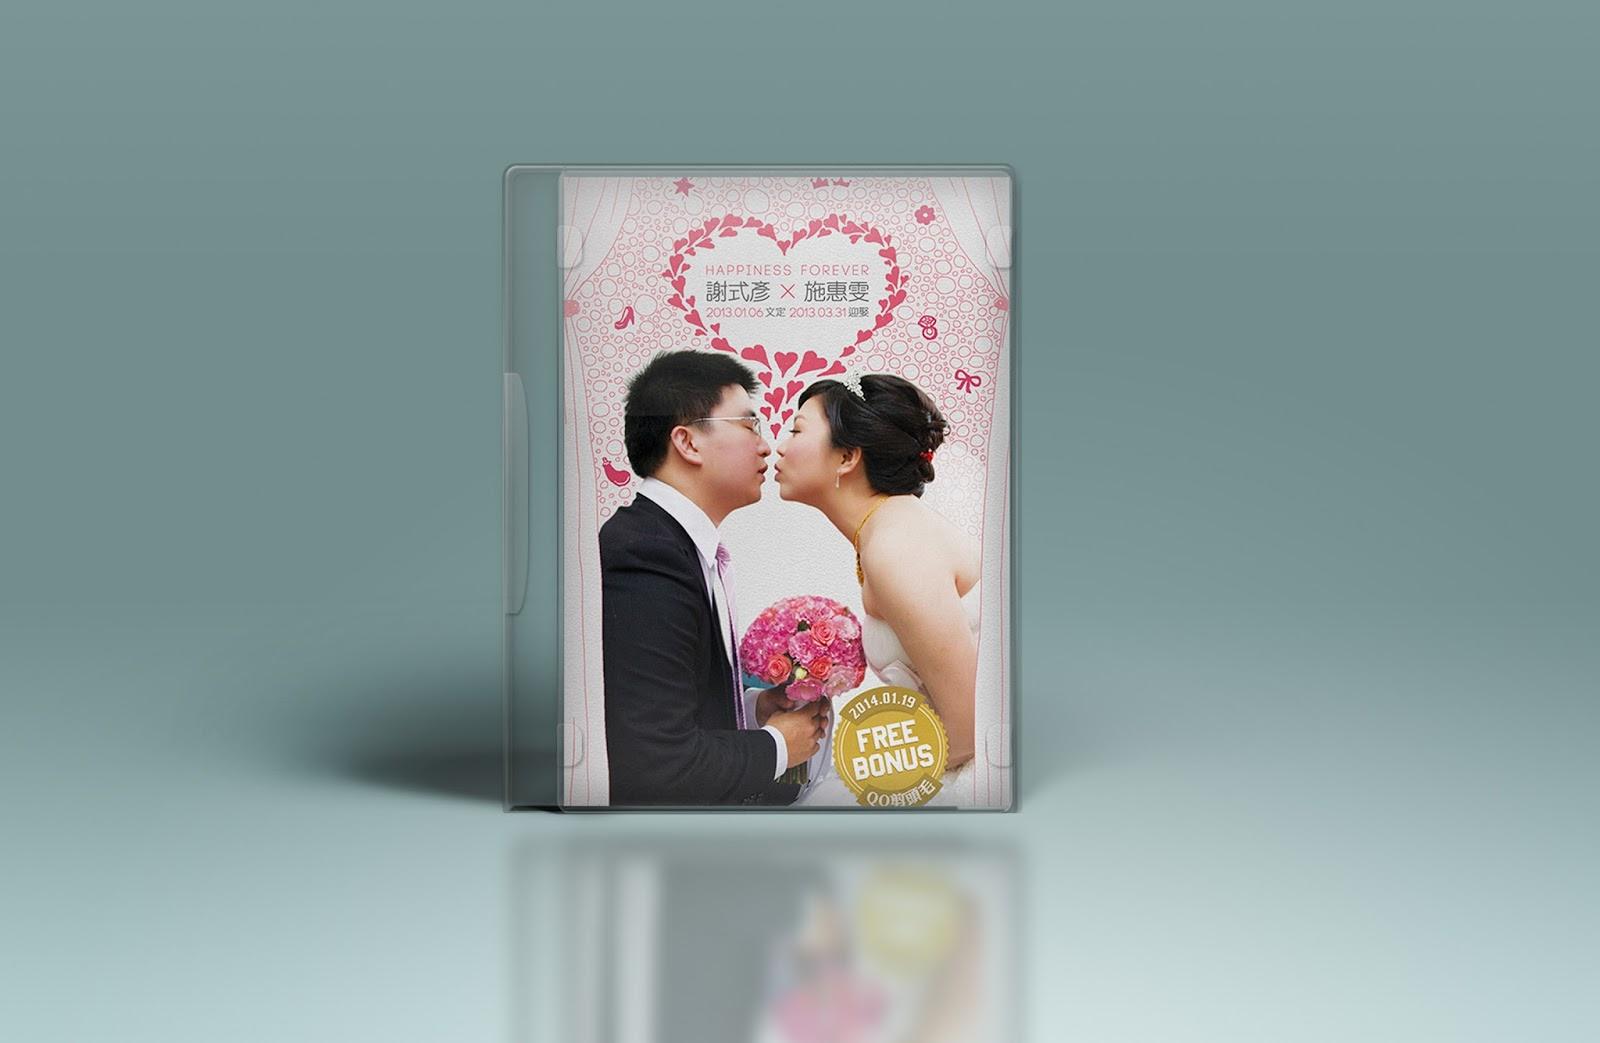 SHOWCASE作品展示 | 式彥×惠雯婚攝DVD封面設計 by MUMULab.com